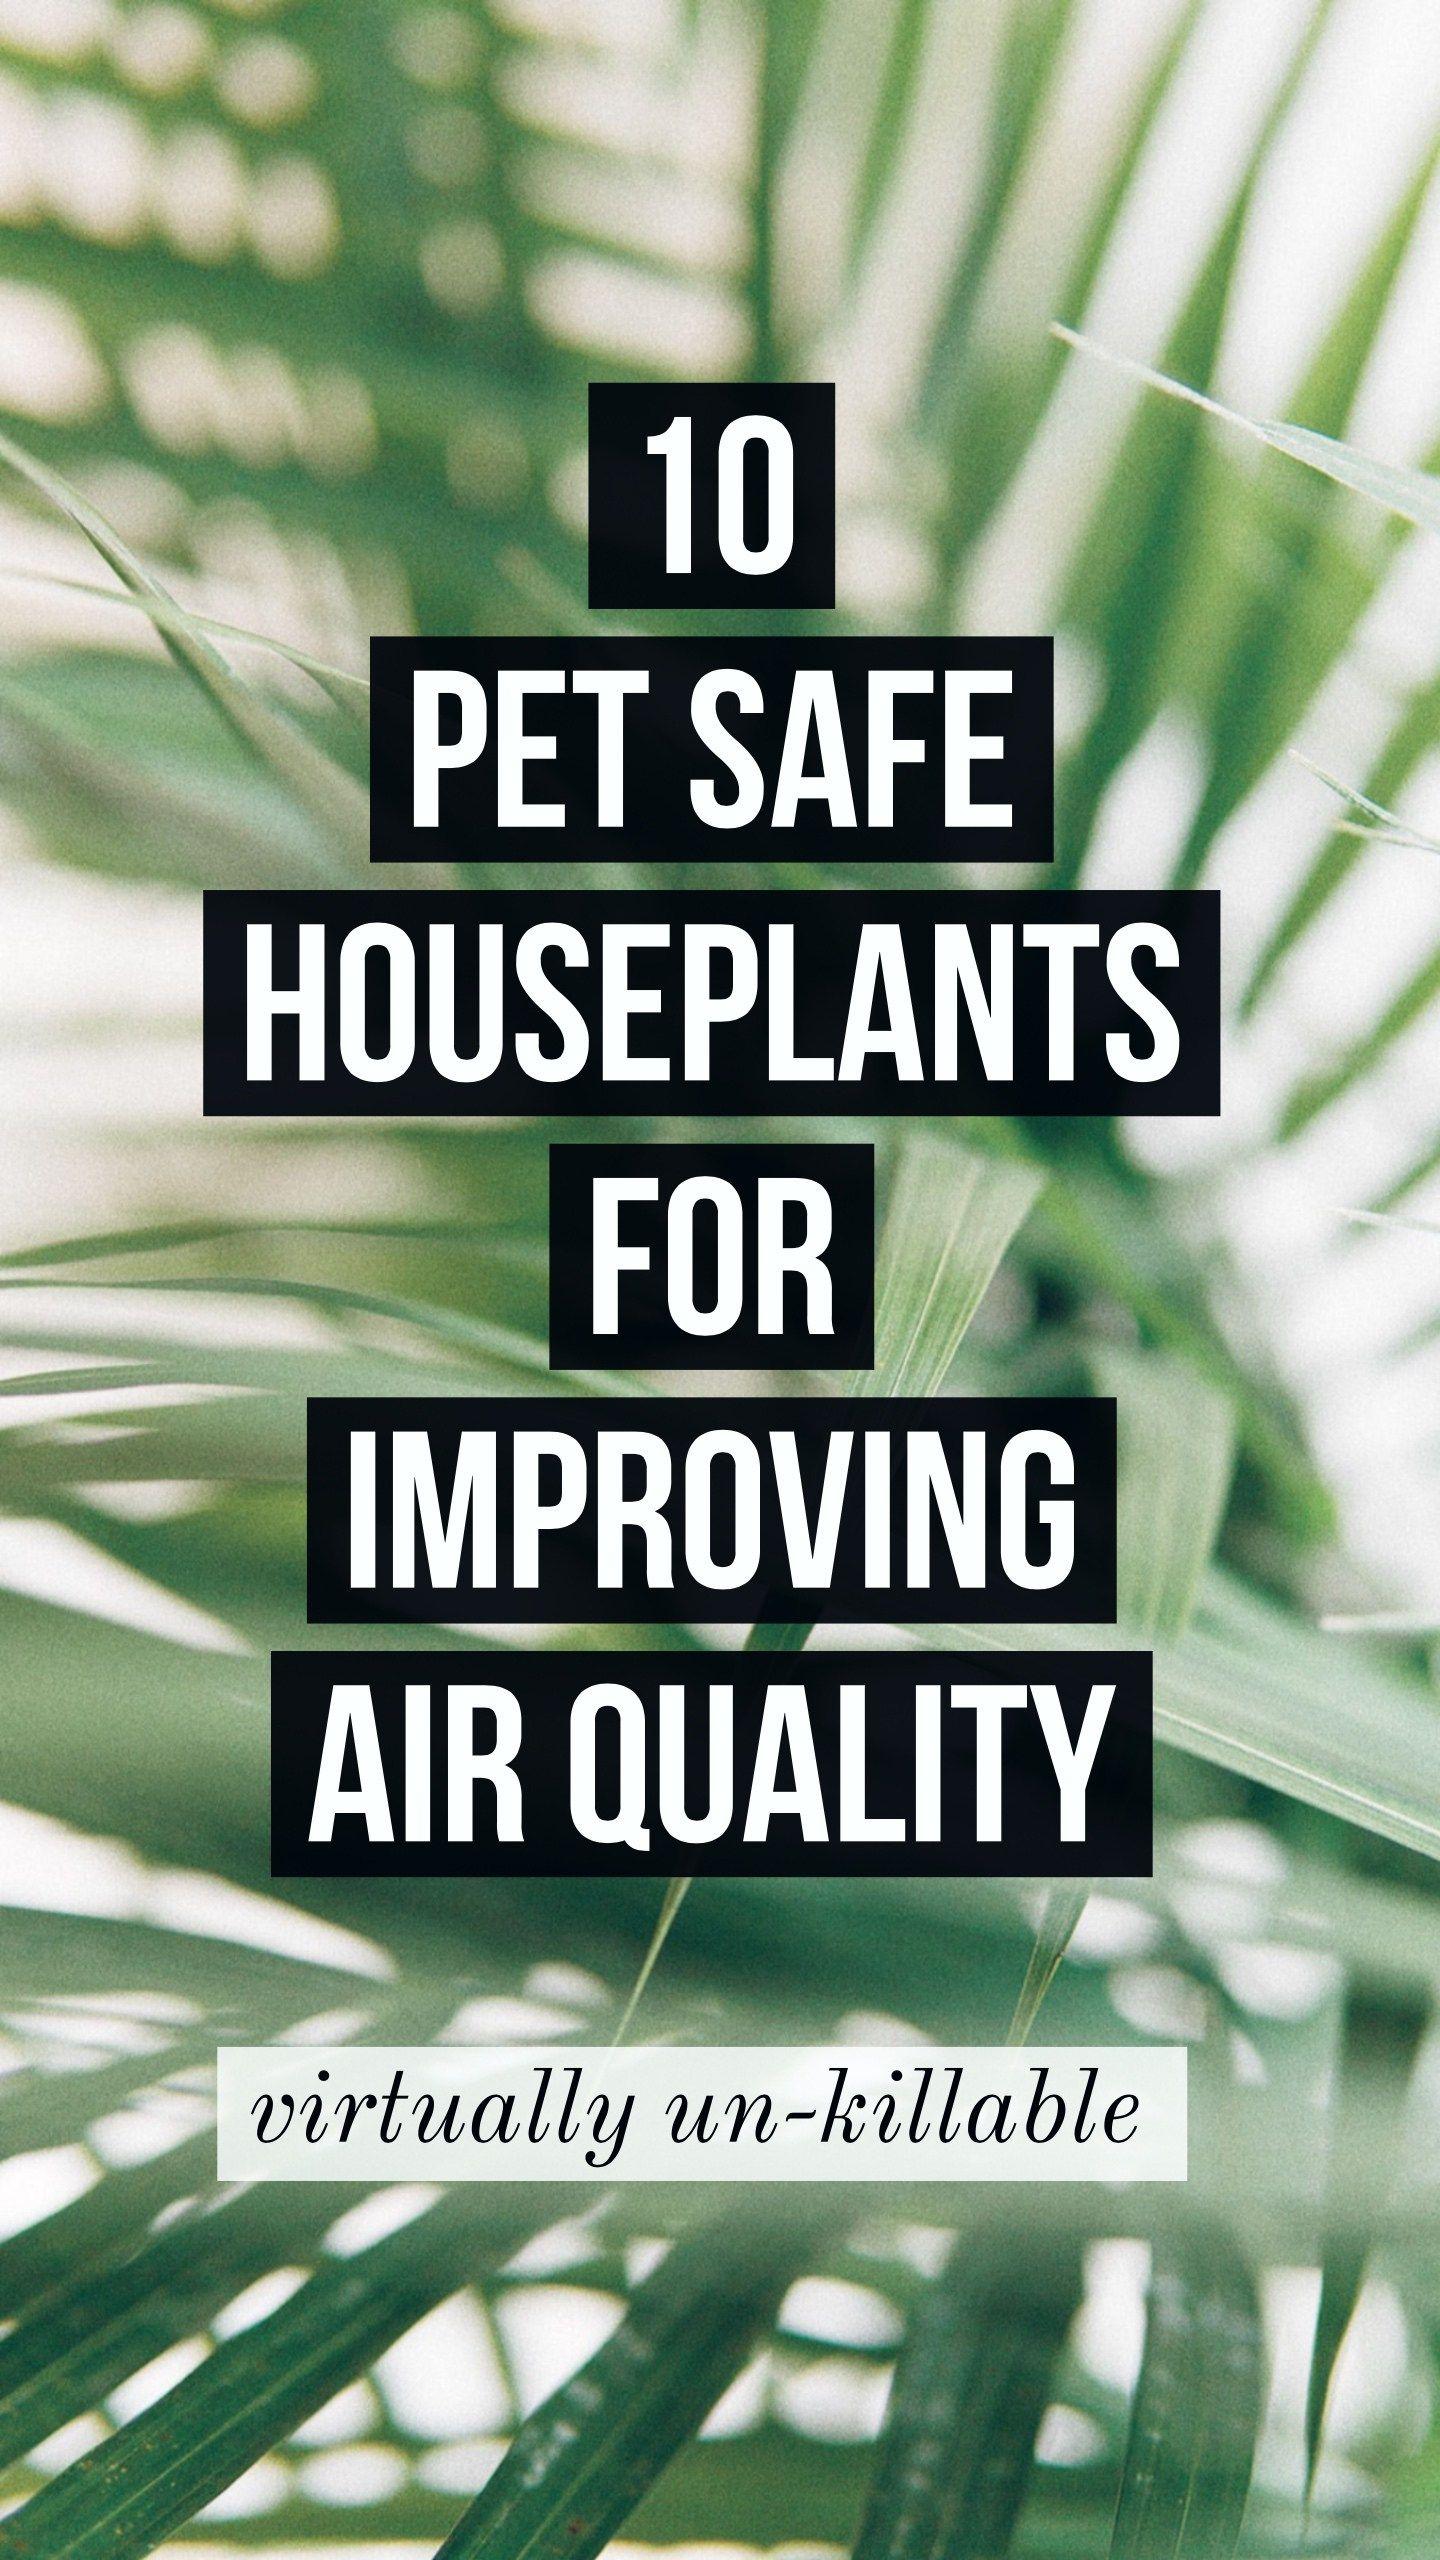 Pet Safe Air Purifying Houseplants Plantlady Houseplants For Clean Air Houseplants Easy To Care For Safe House Plants Cat Safe House Plants Cat Safe Plants